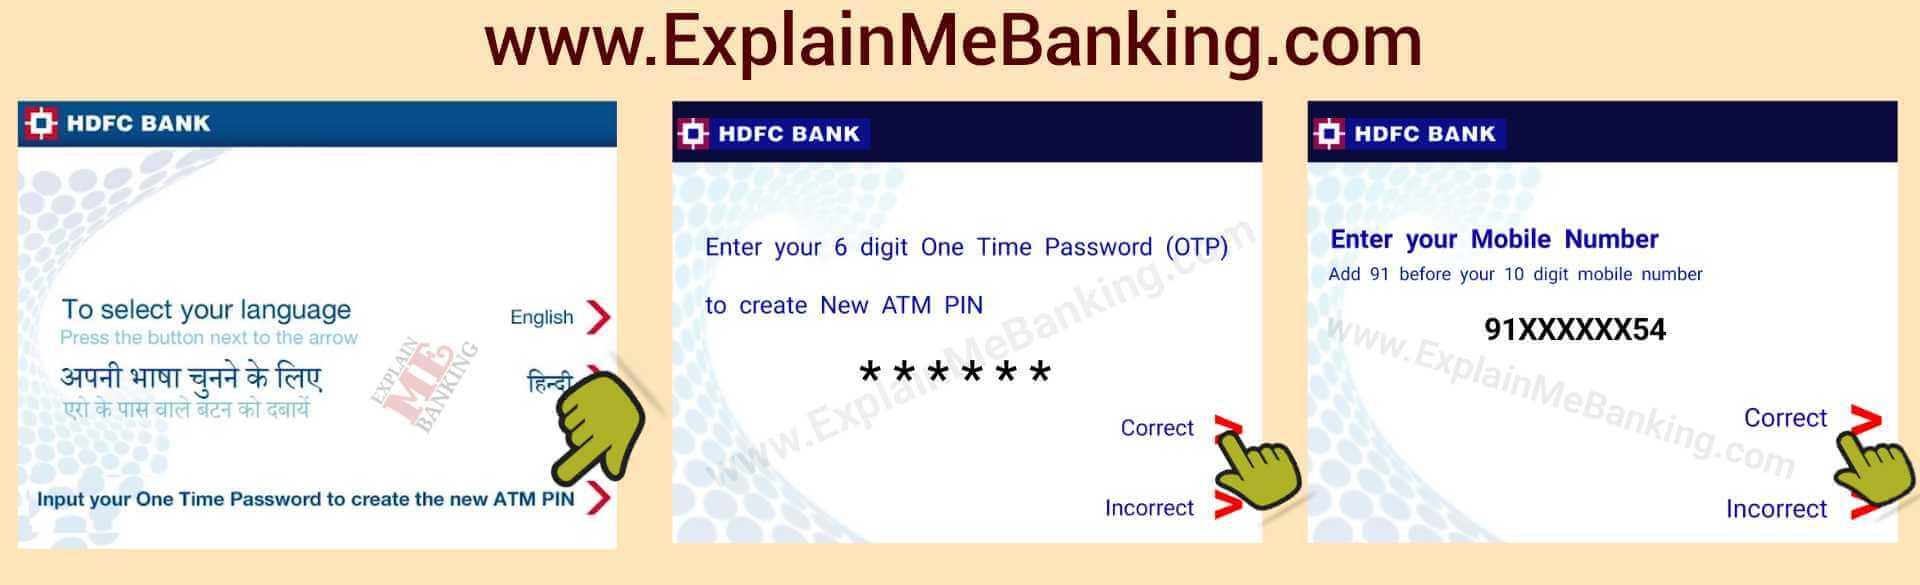 HDFC Bank Debit Card PIN Generation